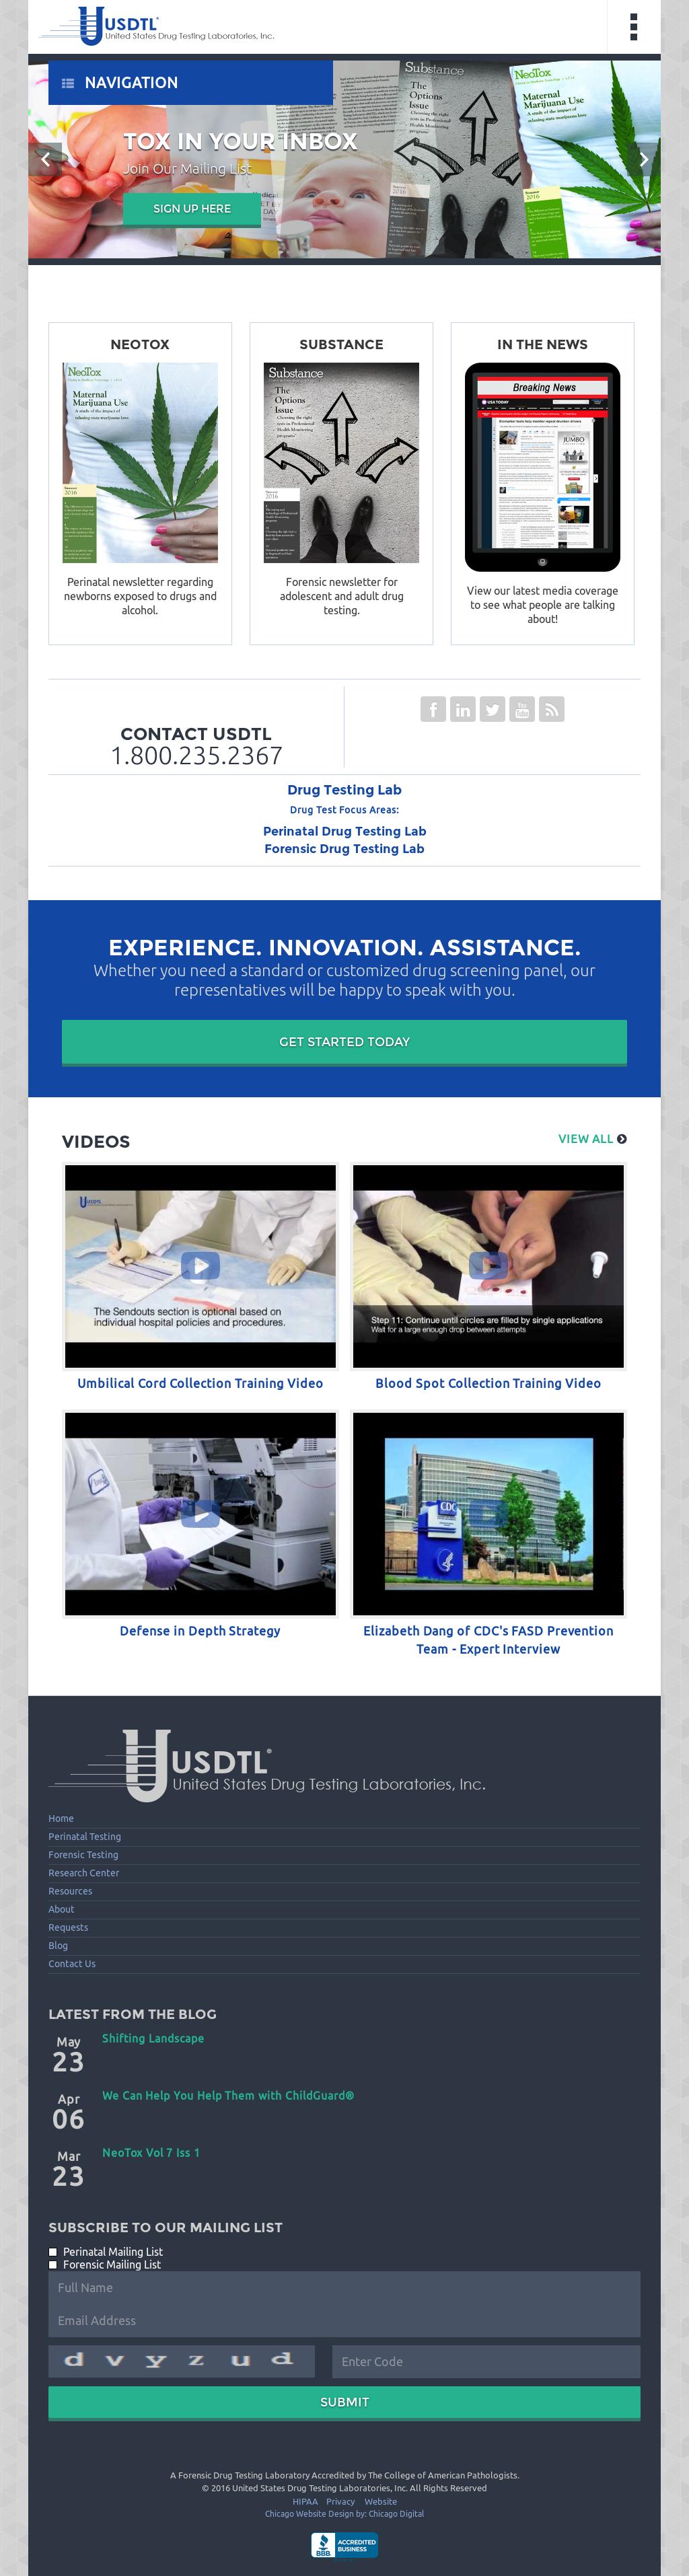 United States Drug Testing Laboratories Competitors, Revenue